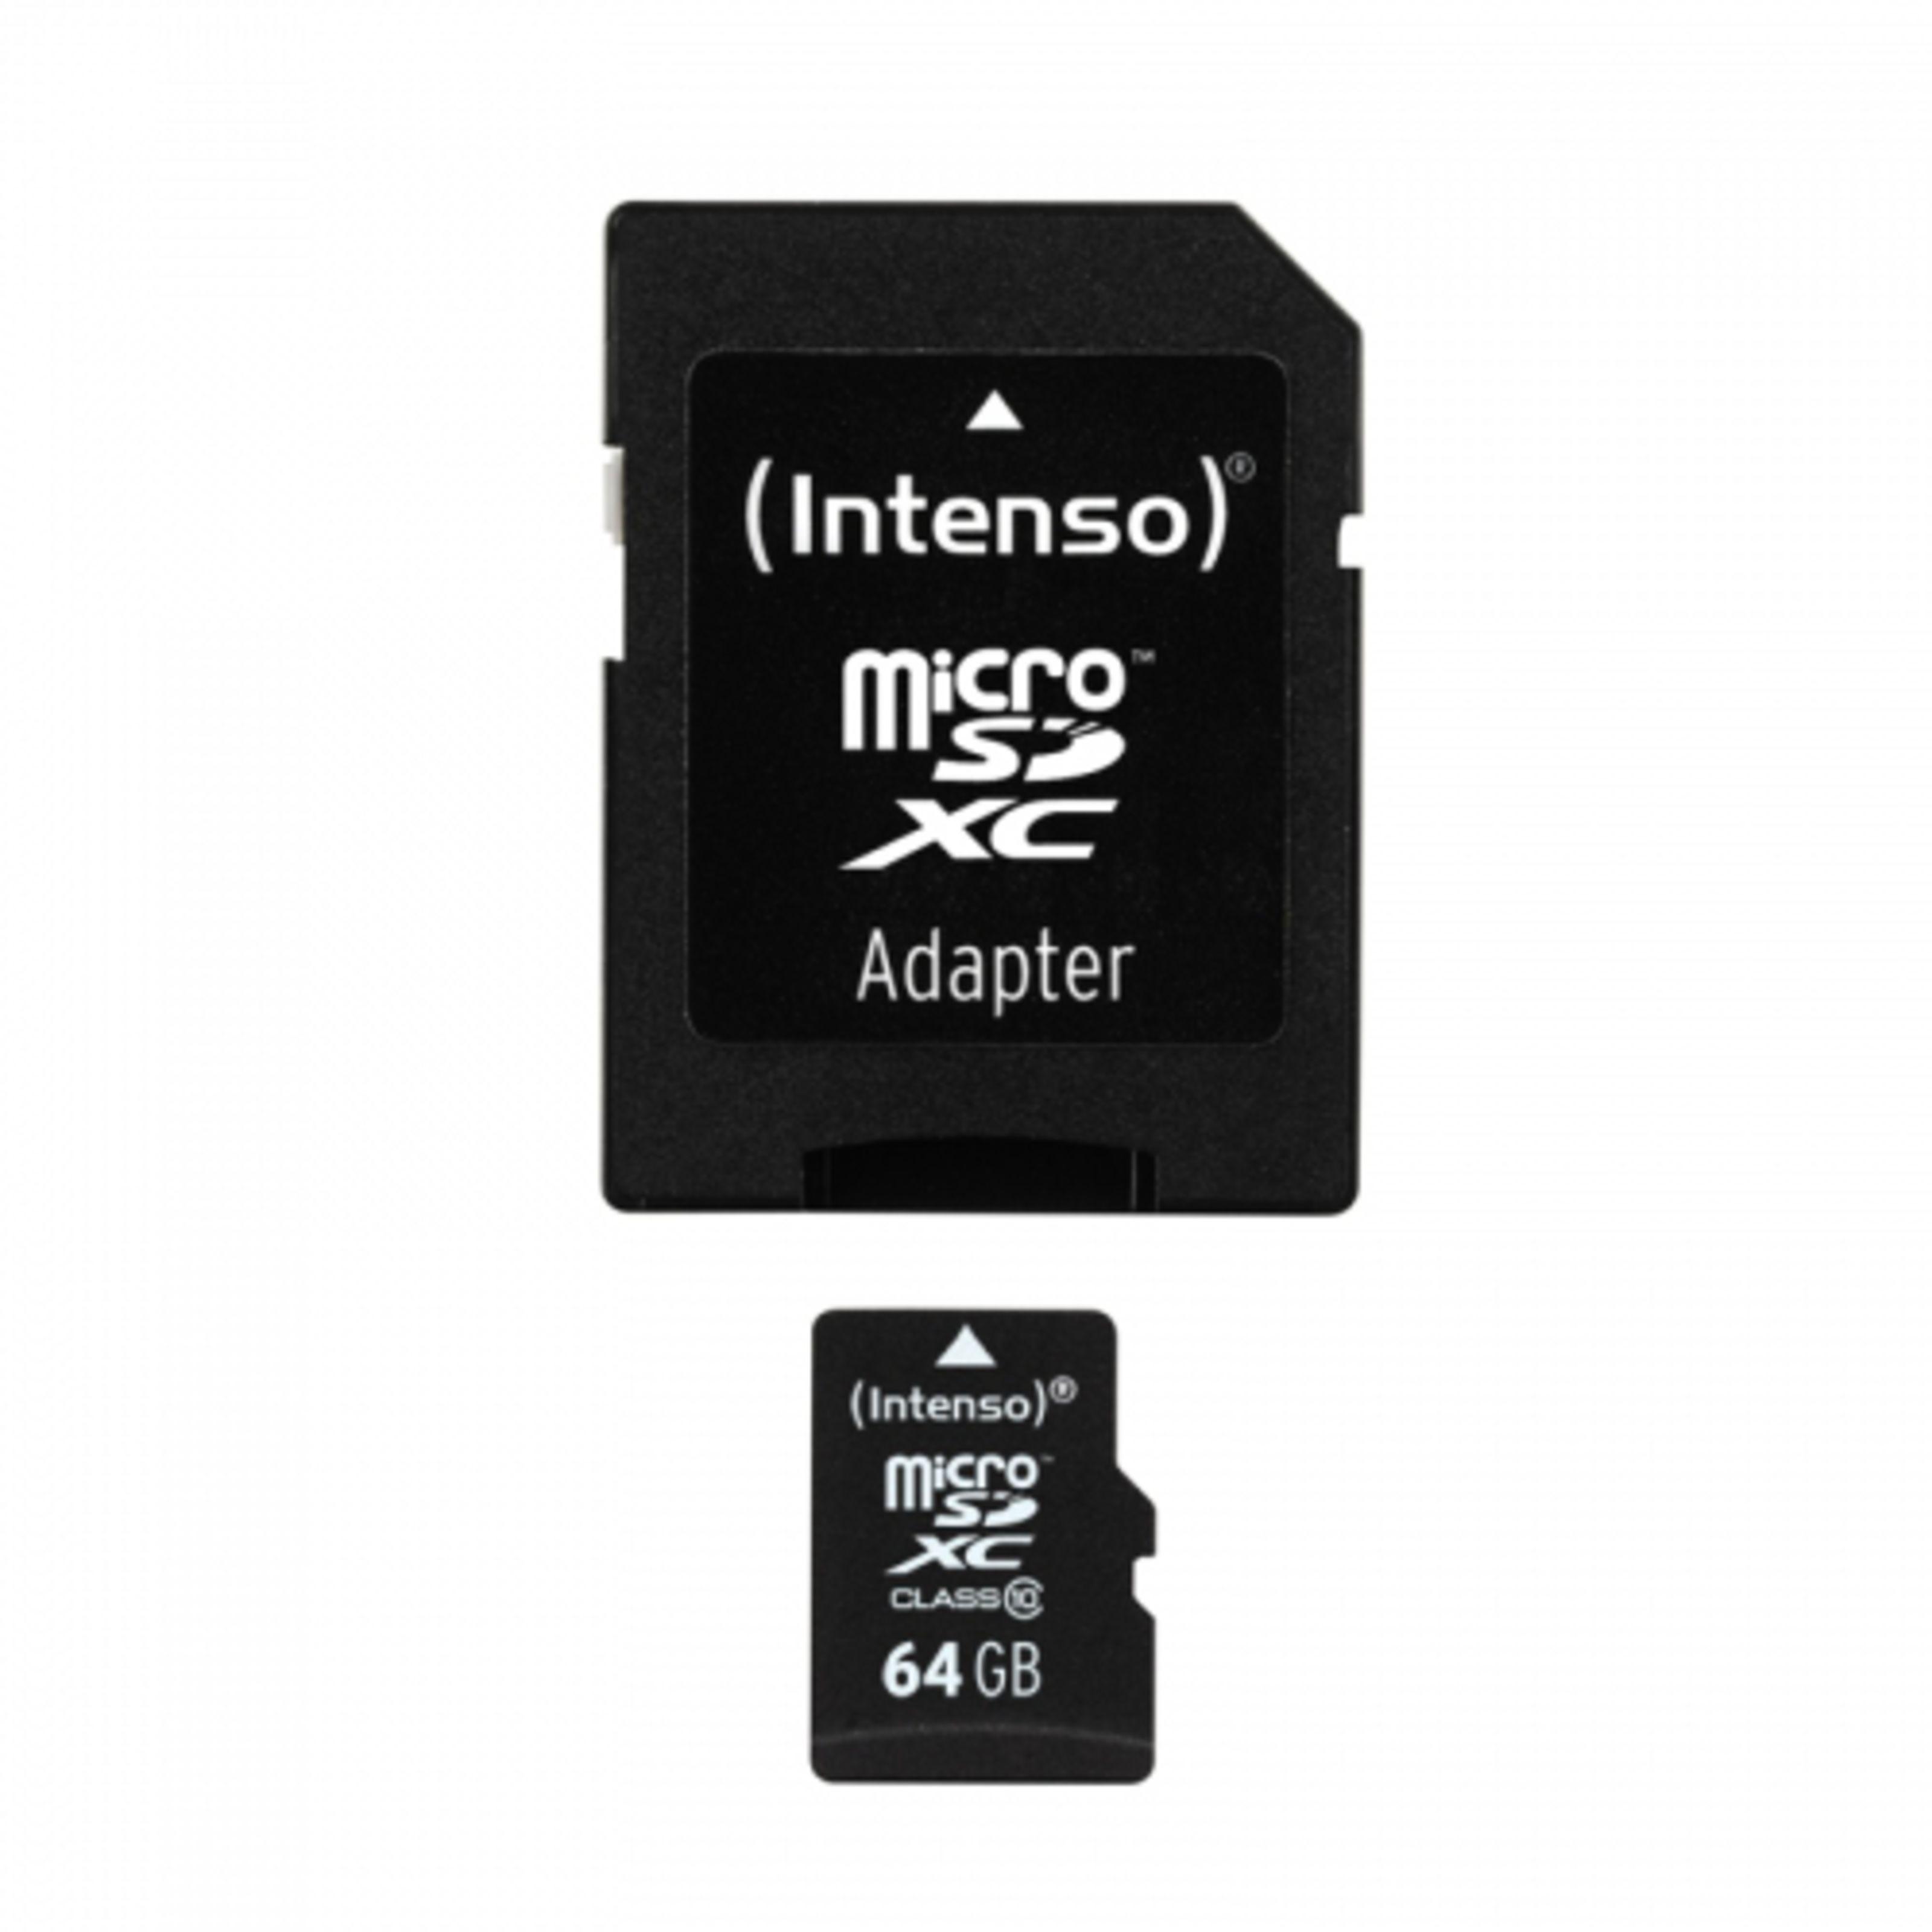 Intenso 64GB Micro SDHC Class 10 Micro Tarjeta SD